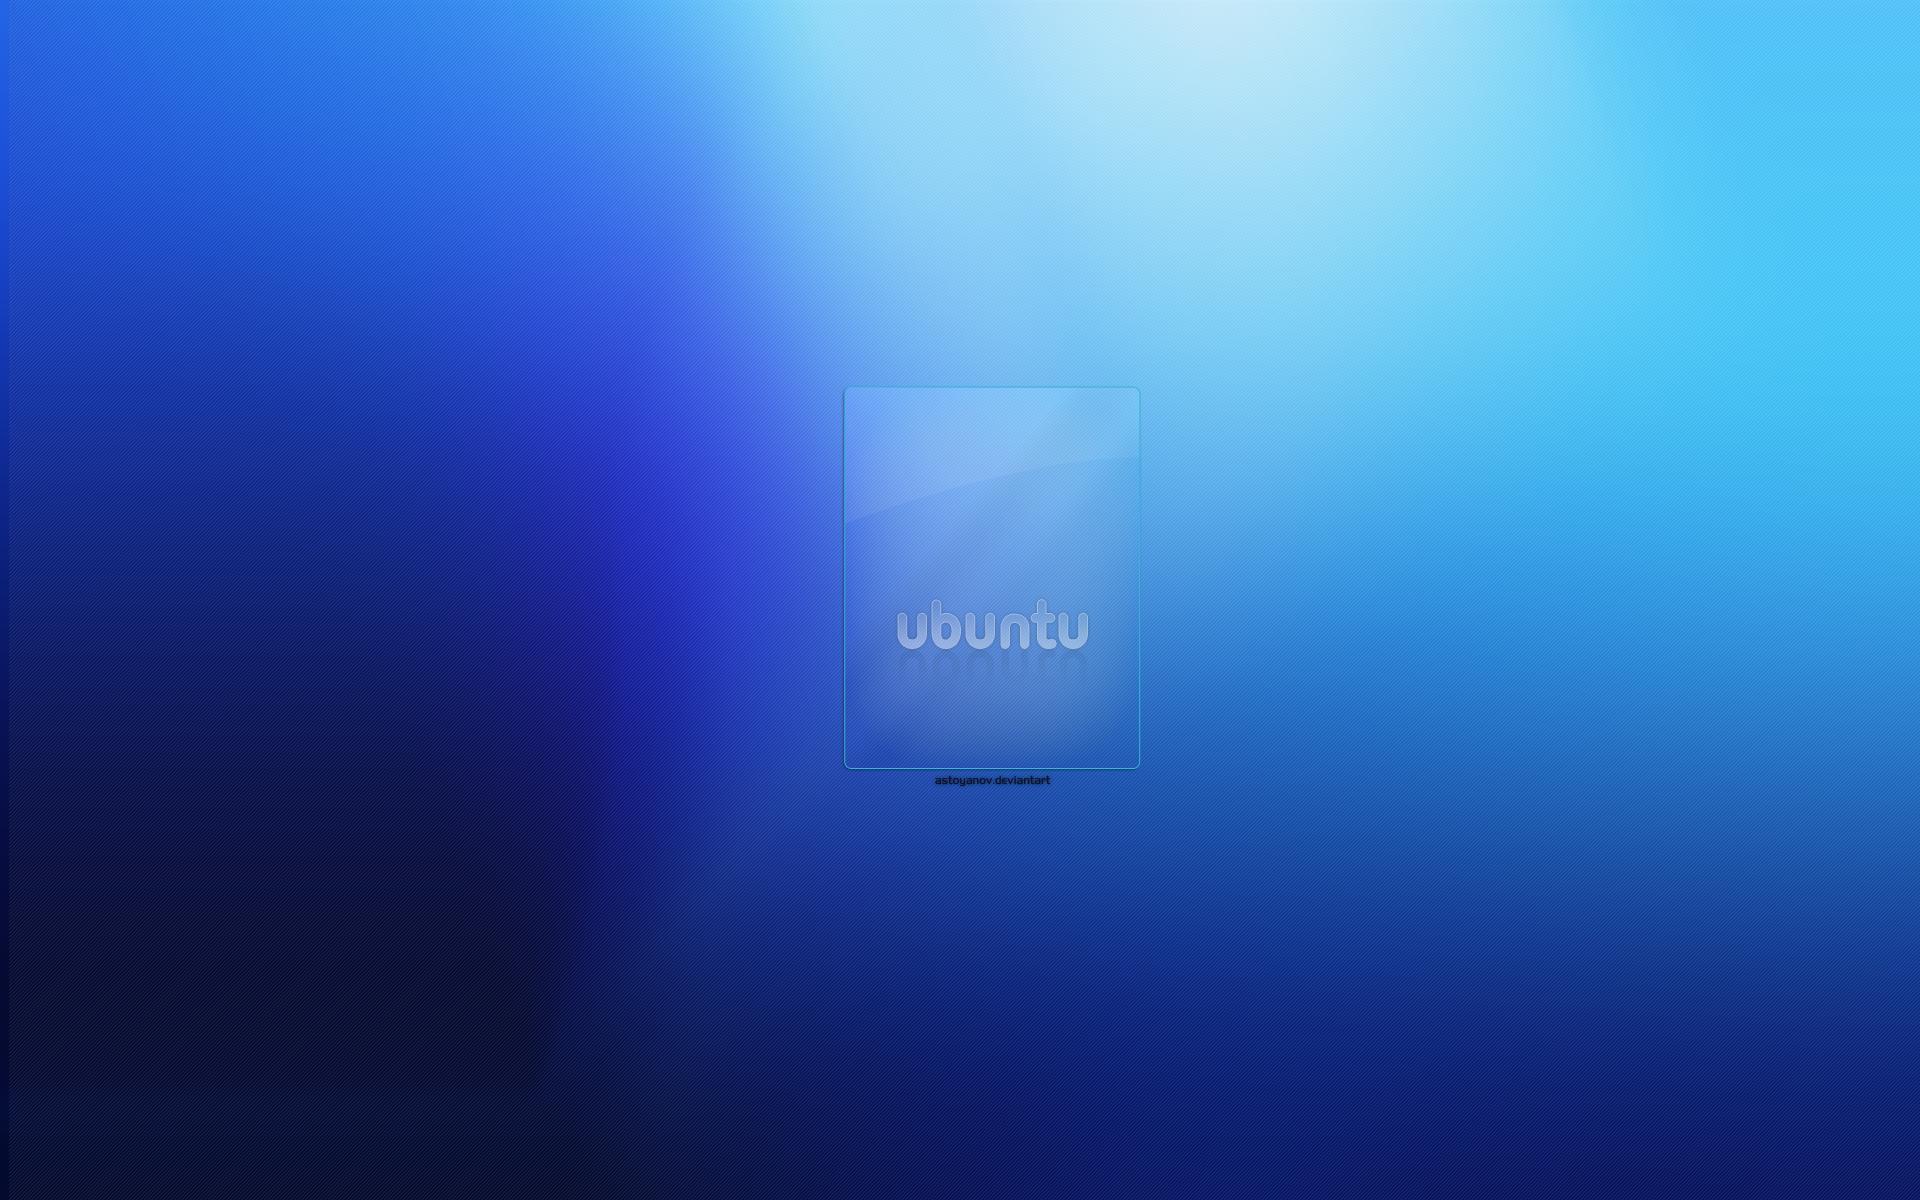 Blue Ubuntu Computer Computers 1920x1200 1920x1200